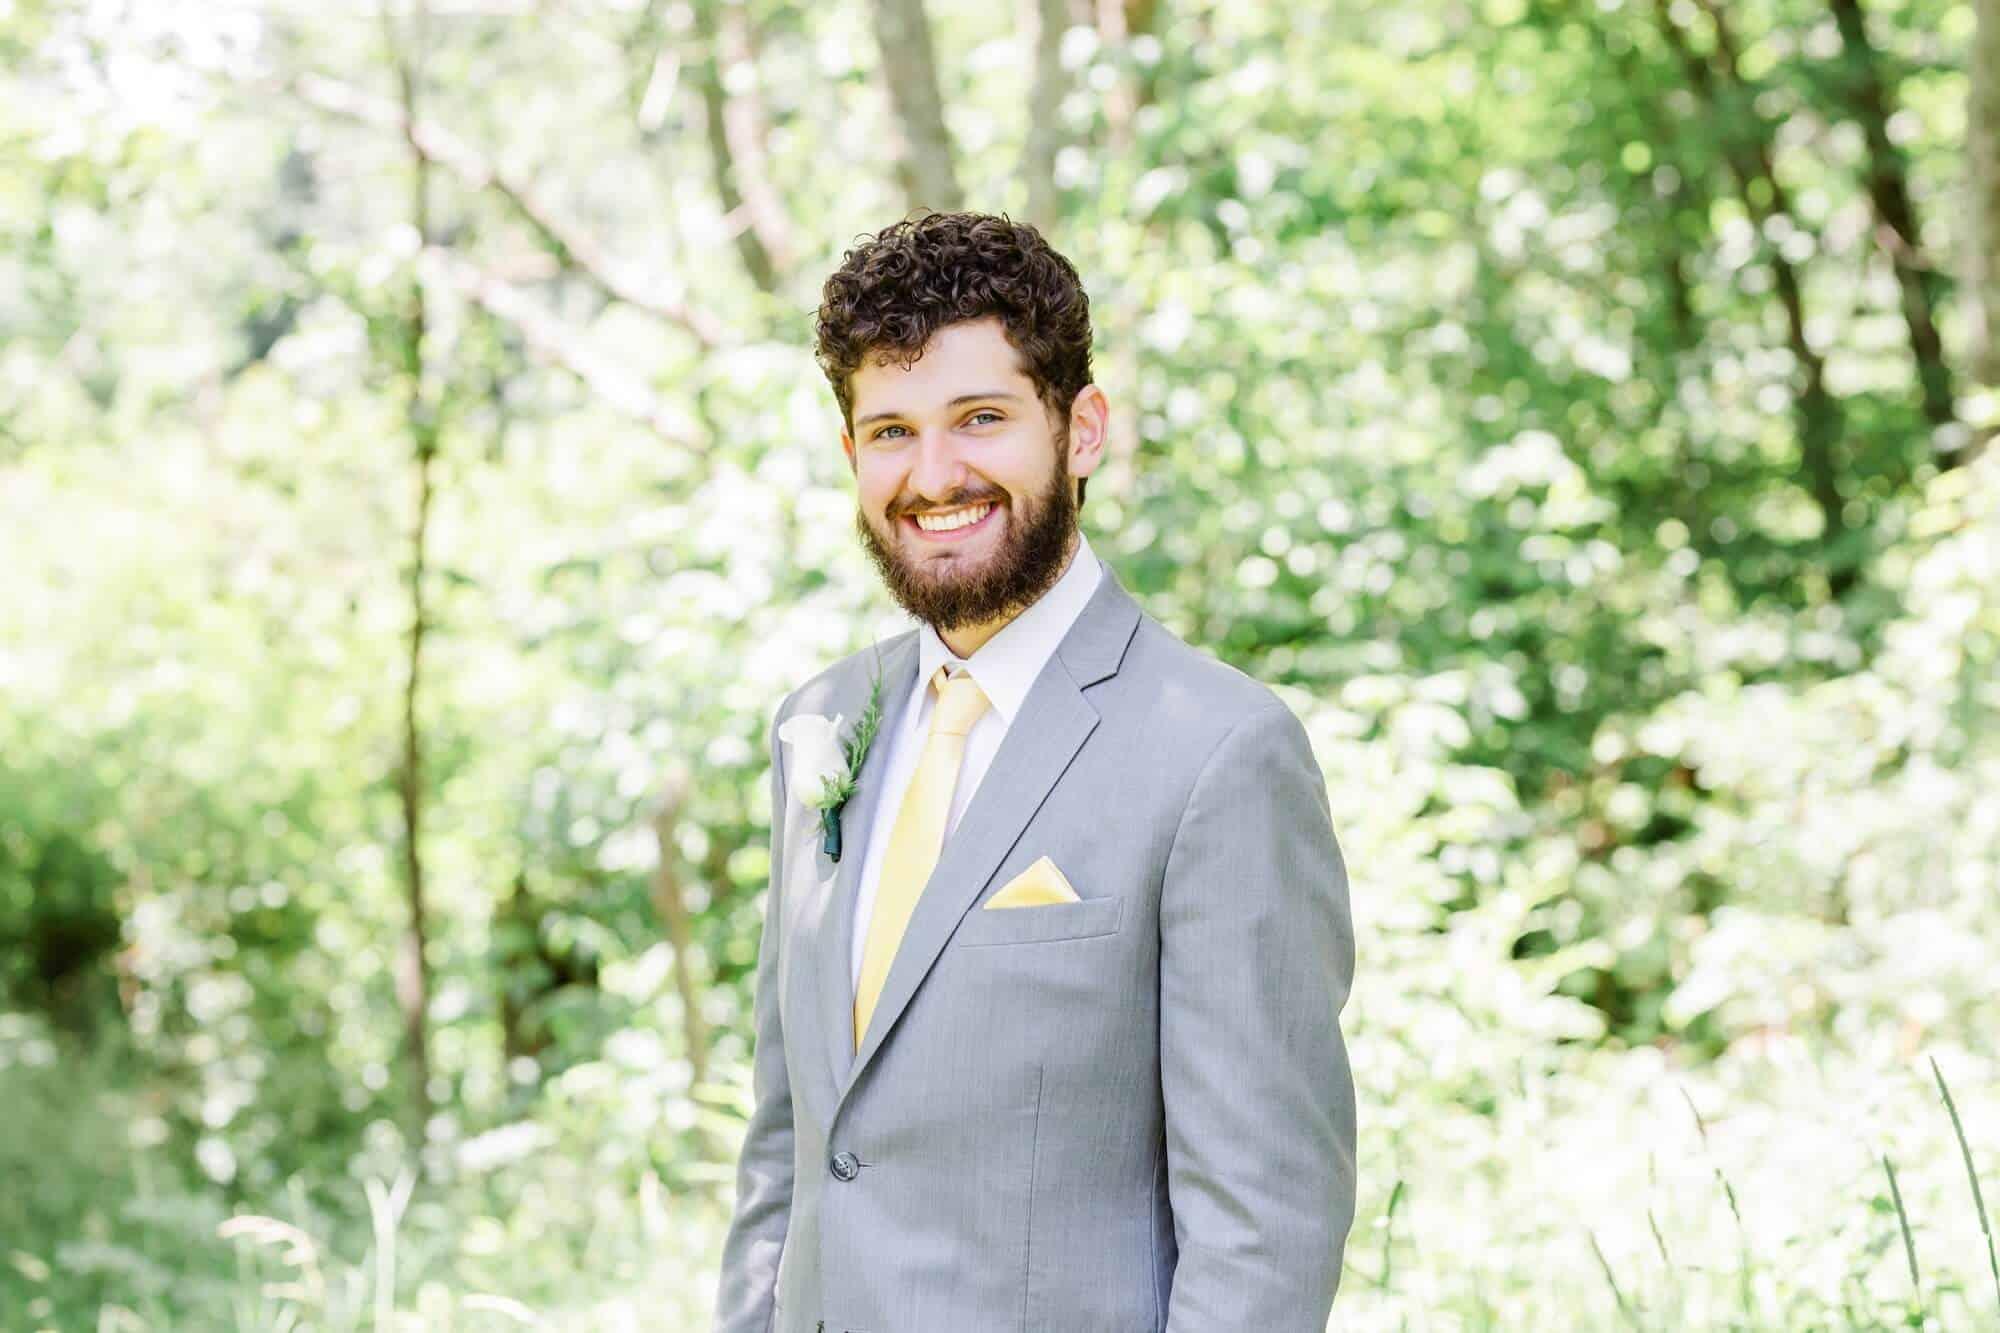 wedding portraits gorman nature center mansfield ohio photographer tiffany murray